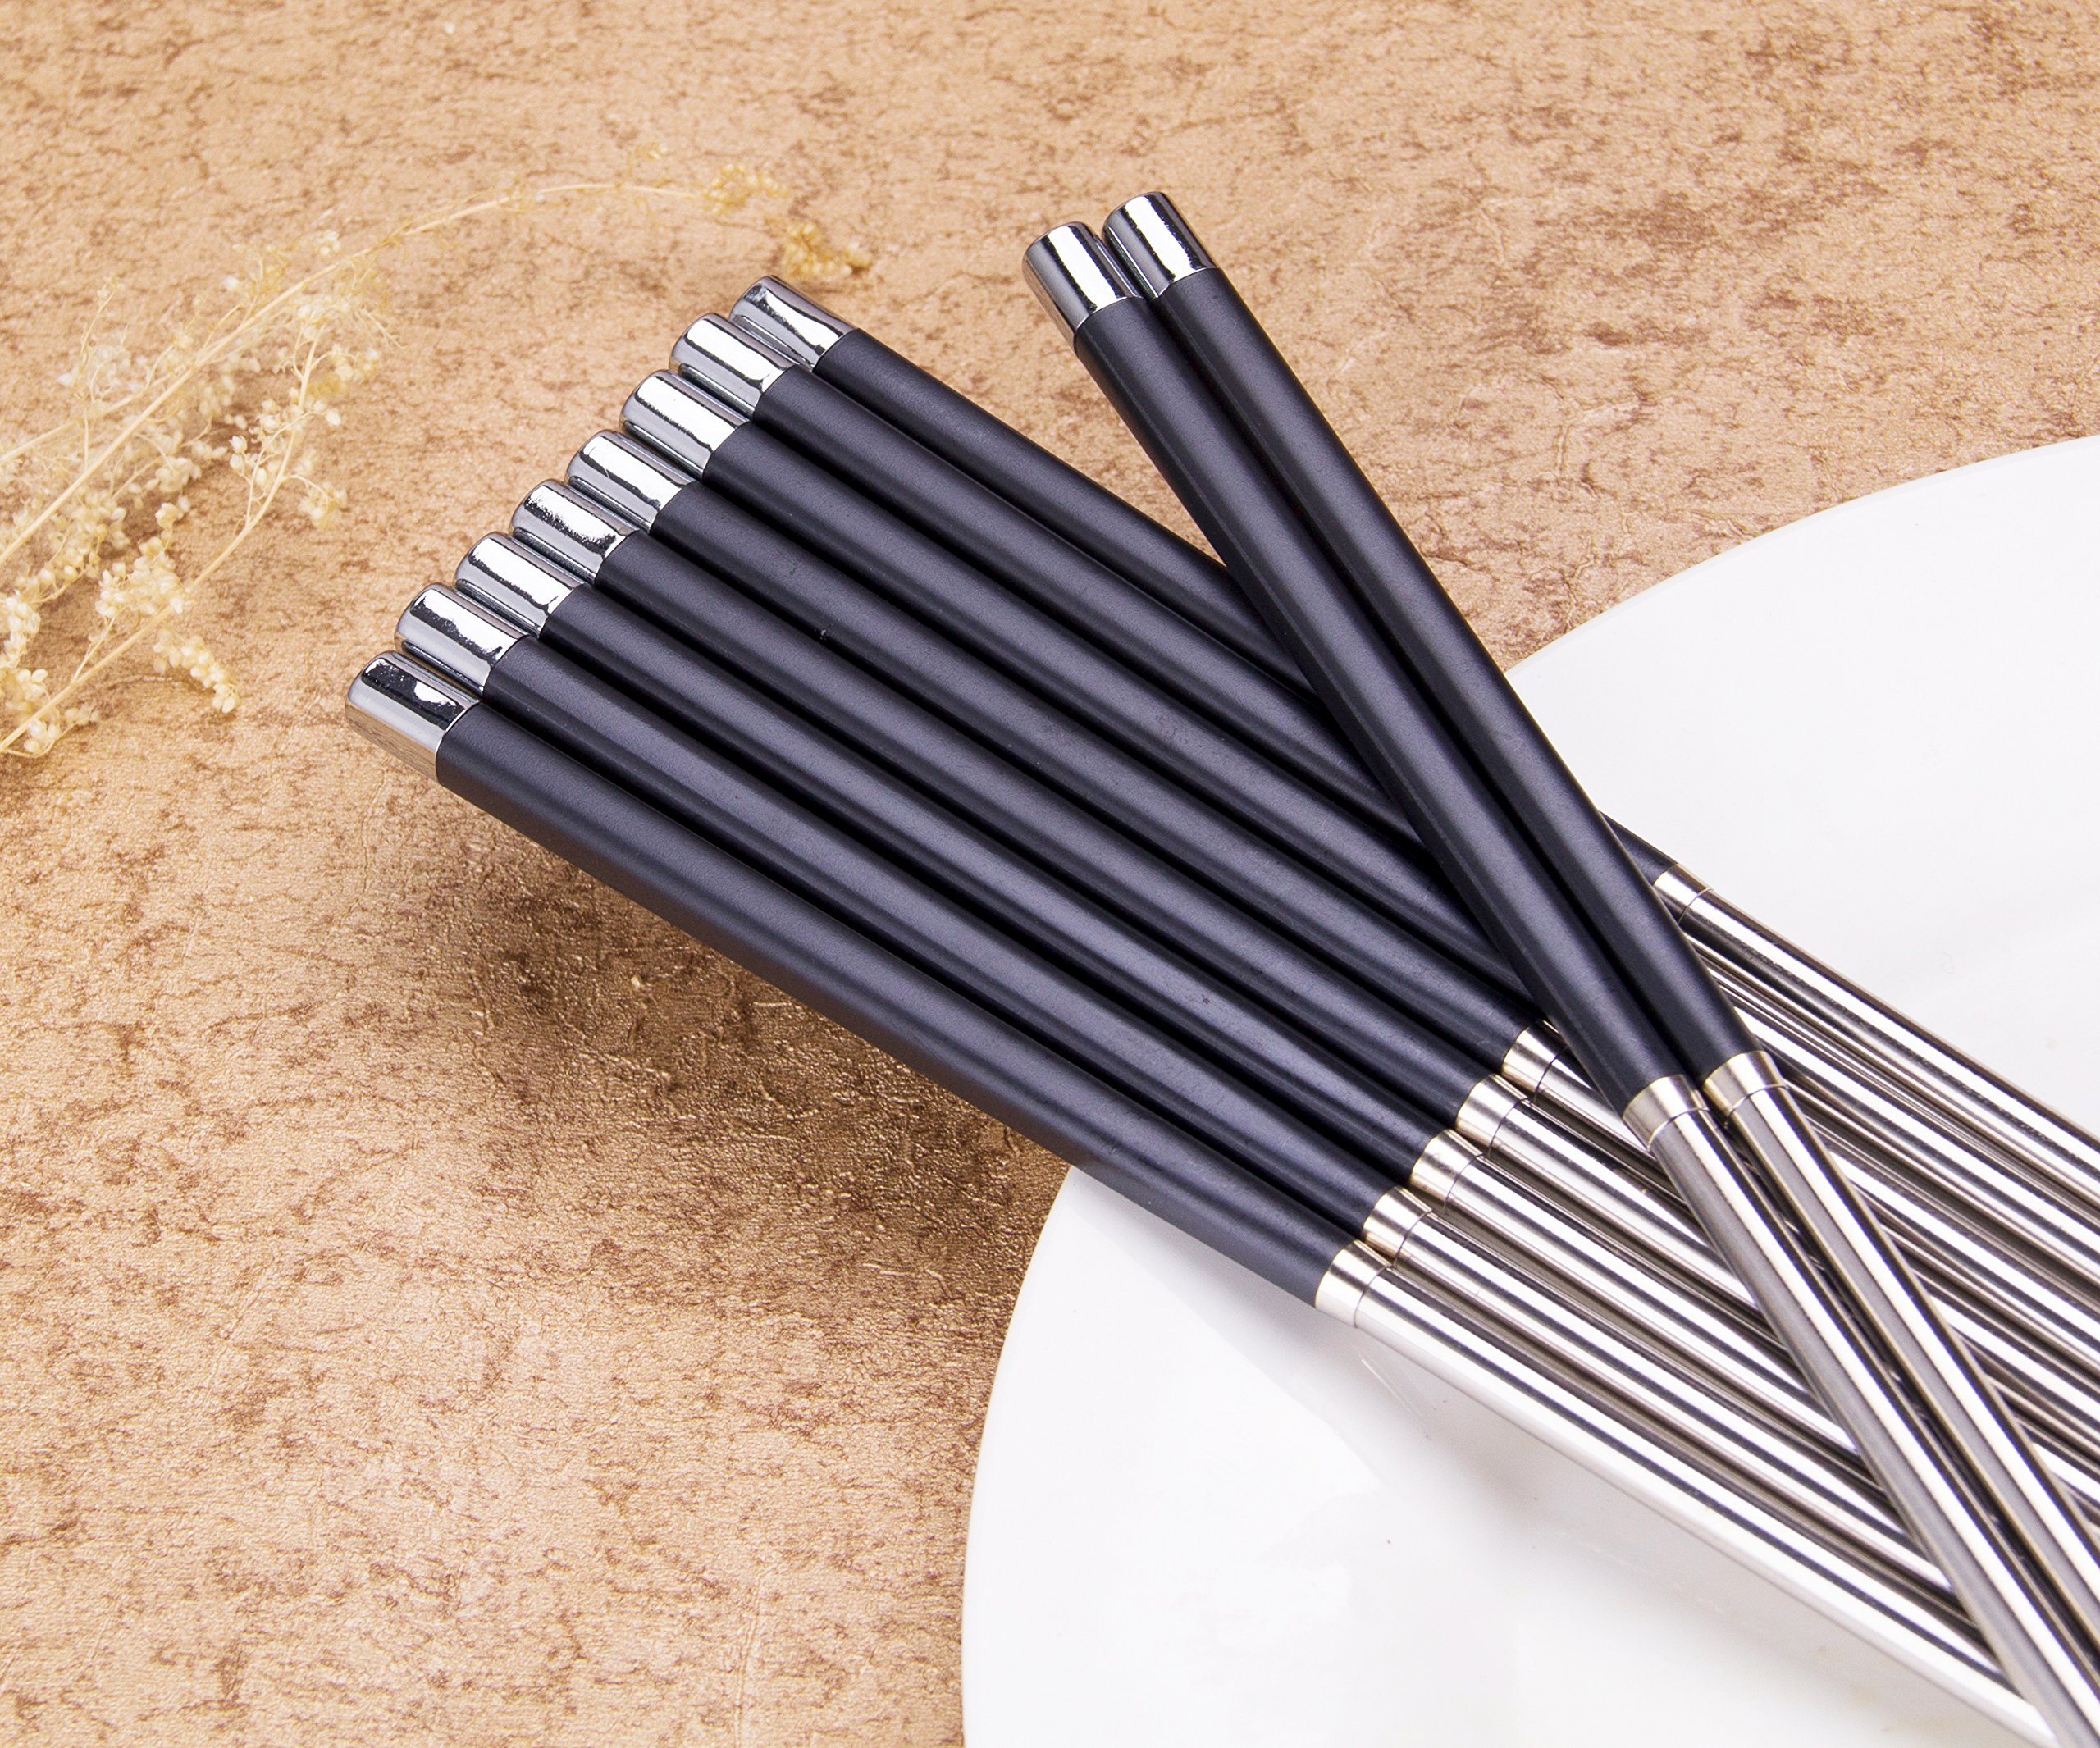 Foster (Goldage) 5-Pairs Stainless Steel & Fiberglass Dishwasher-safe Chopsticks